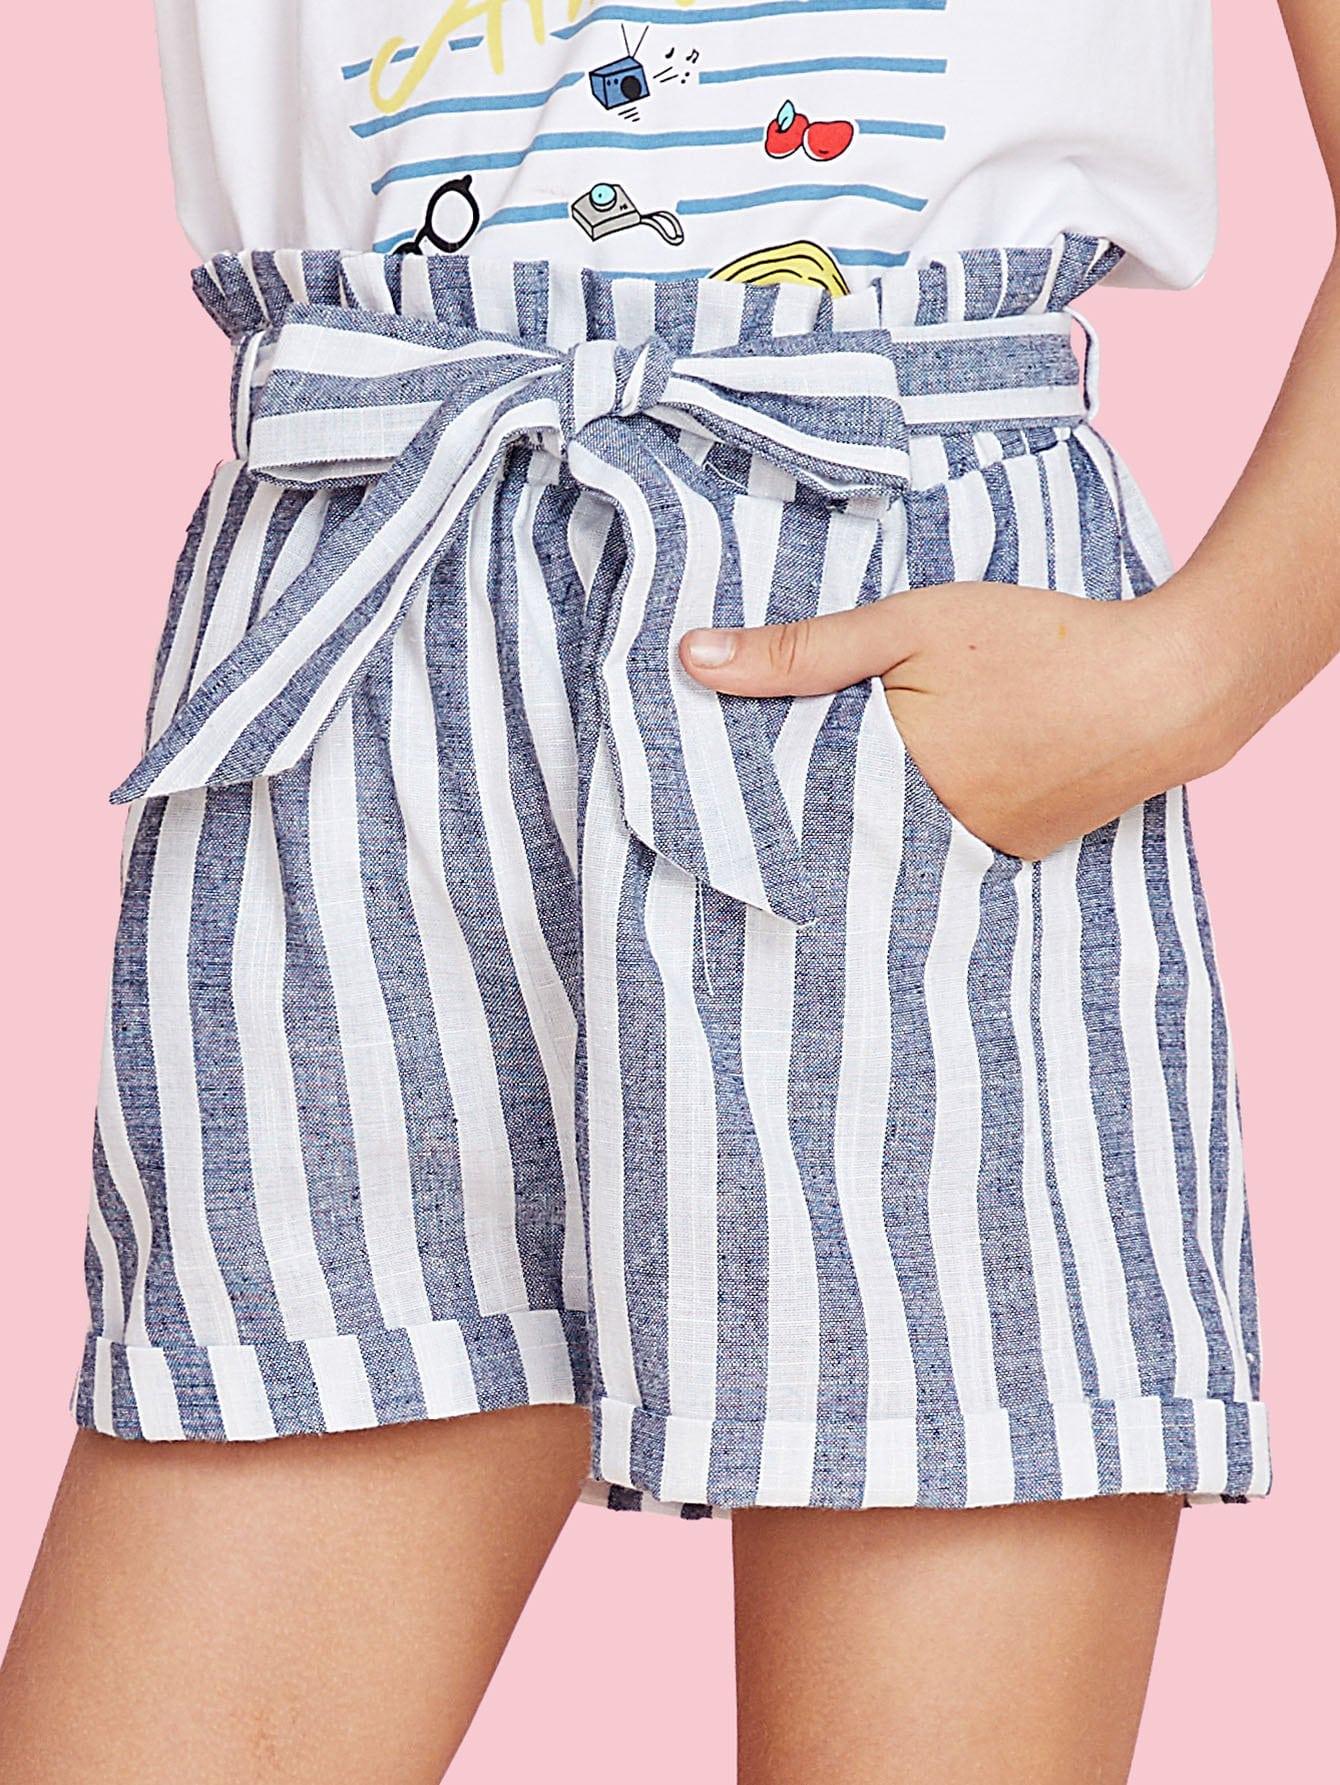 Self Tie Cuffed Hem Striped Shorts sweet wavy hem design striped shorts for women